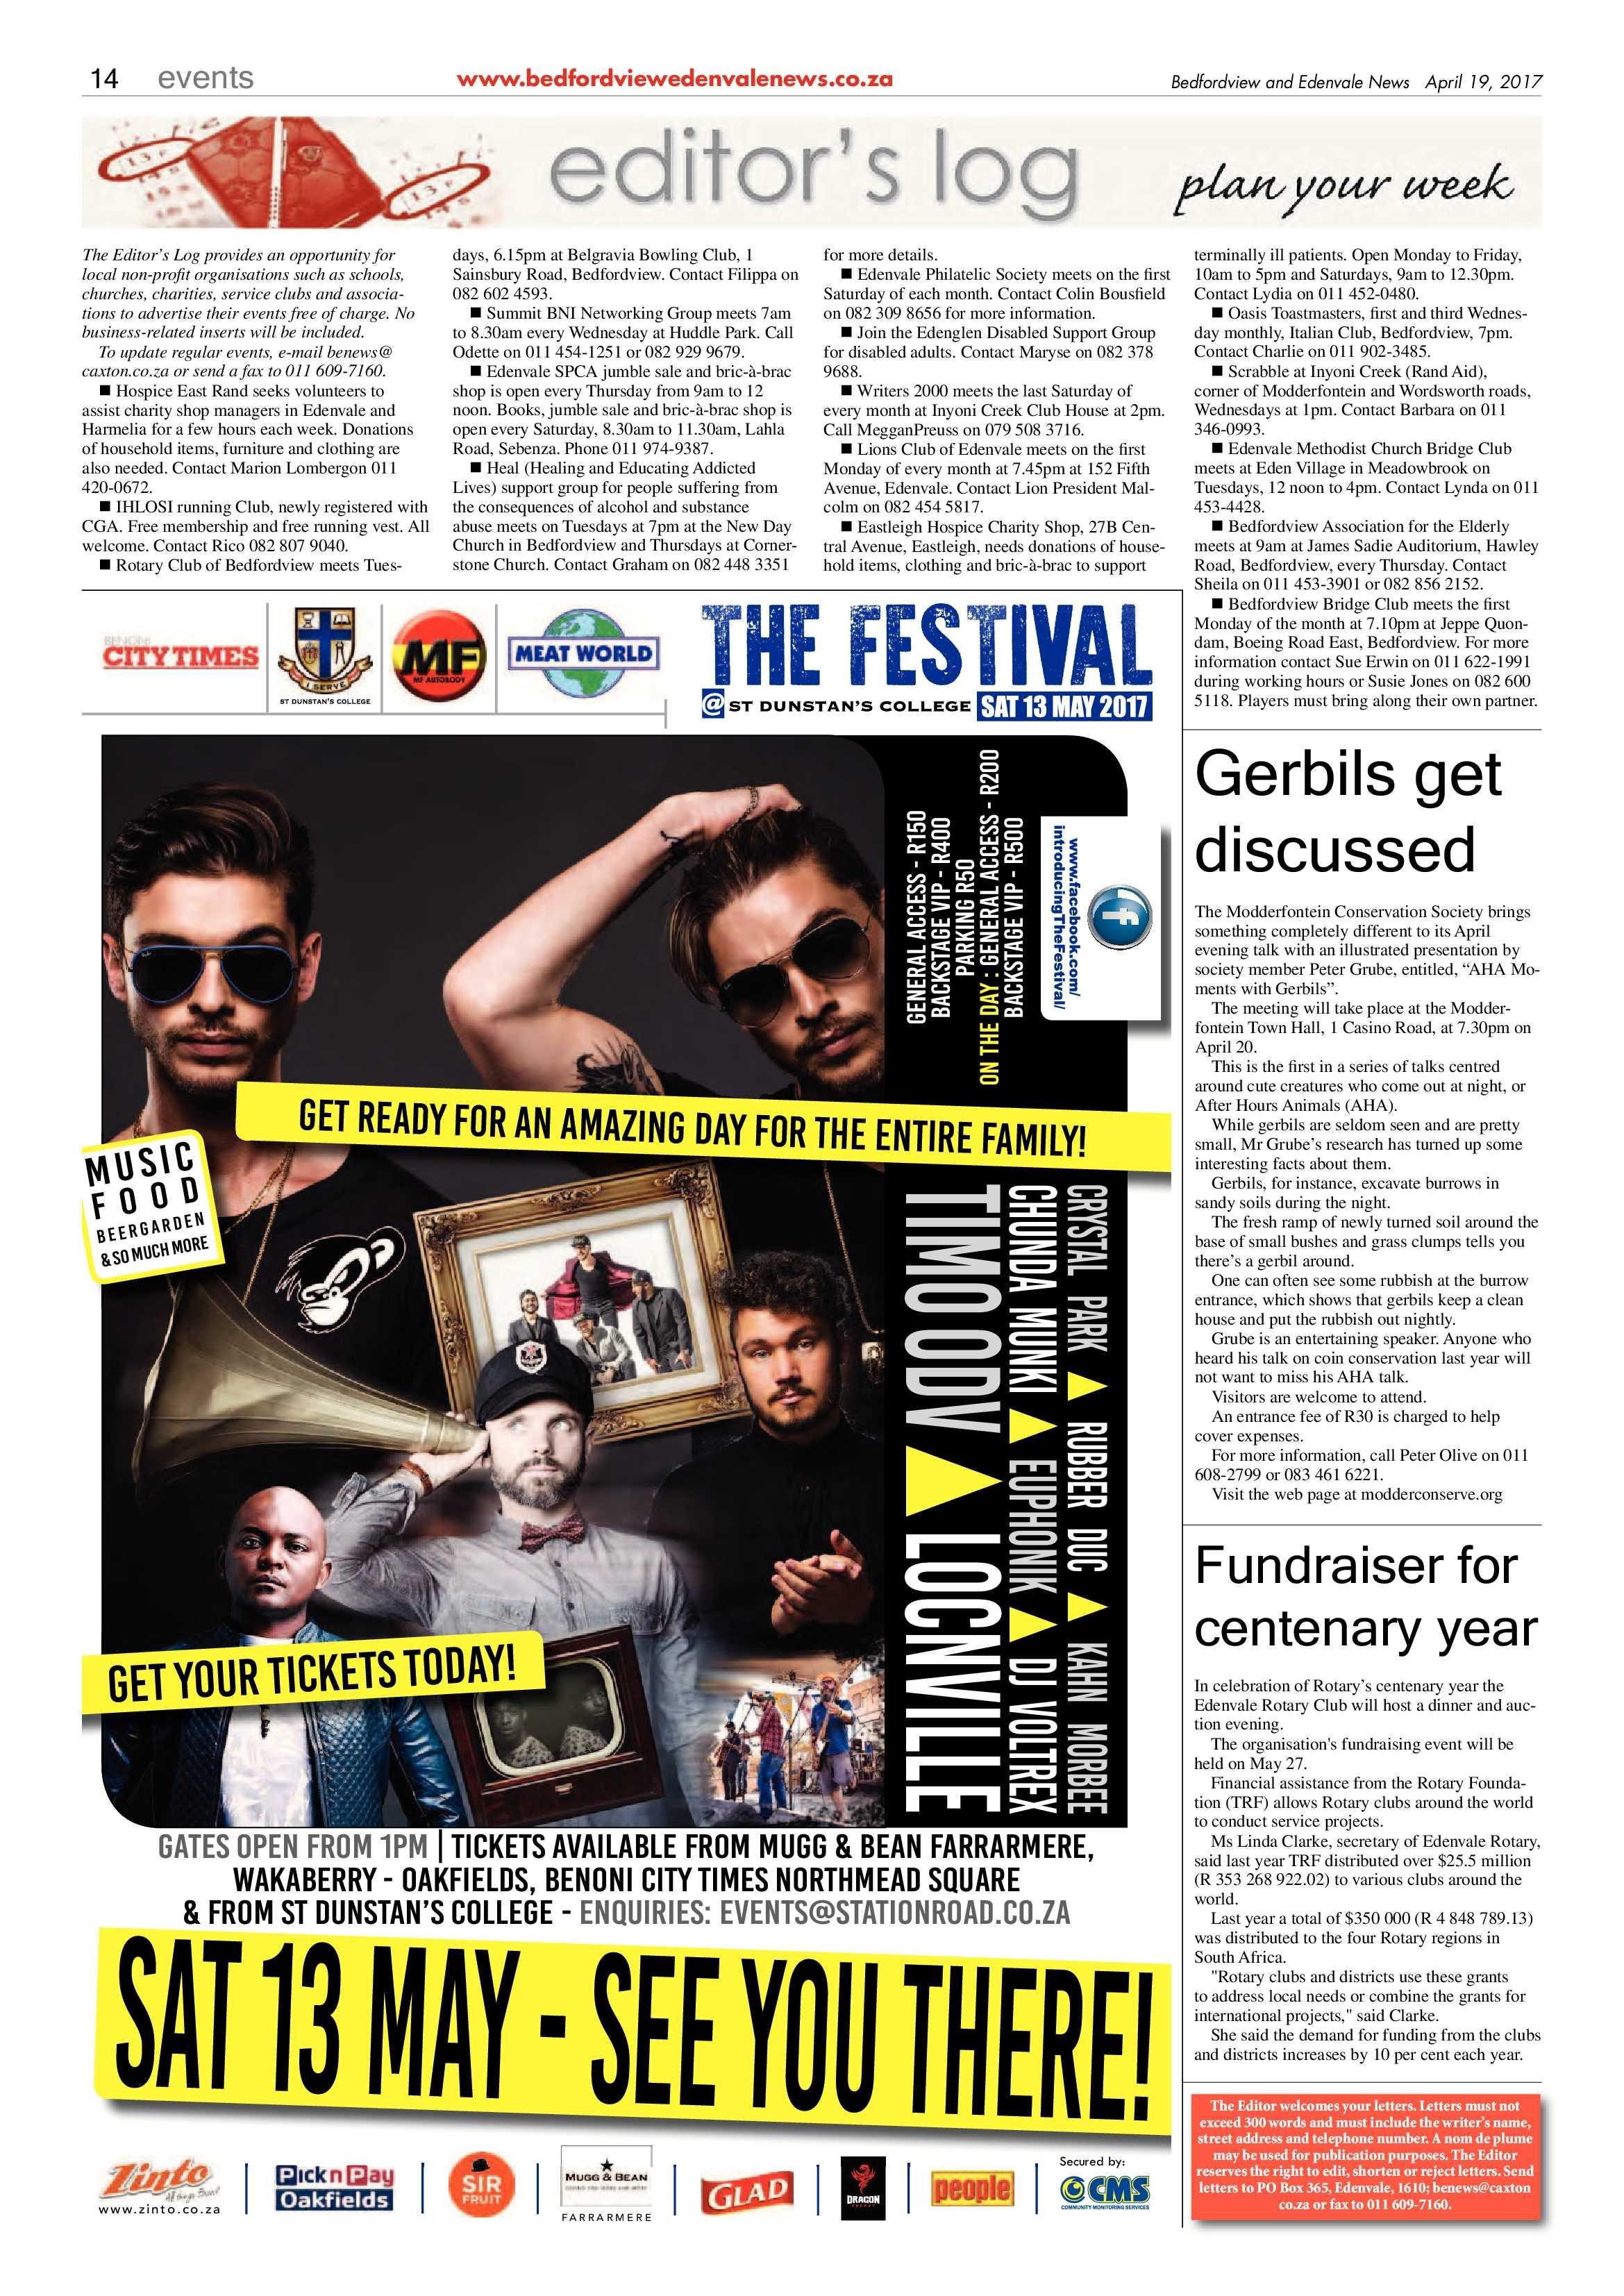 bedfordview-edenvale-news-19-april-2017-epapers-page-14